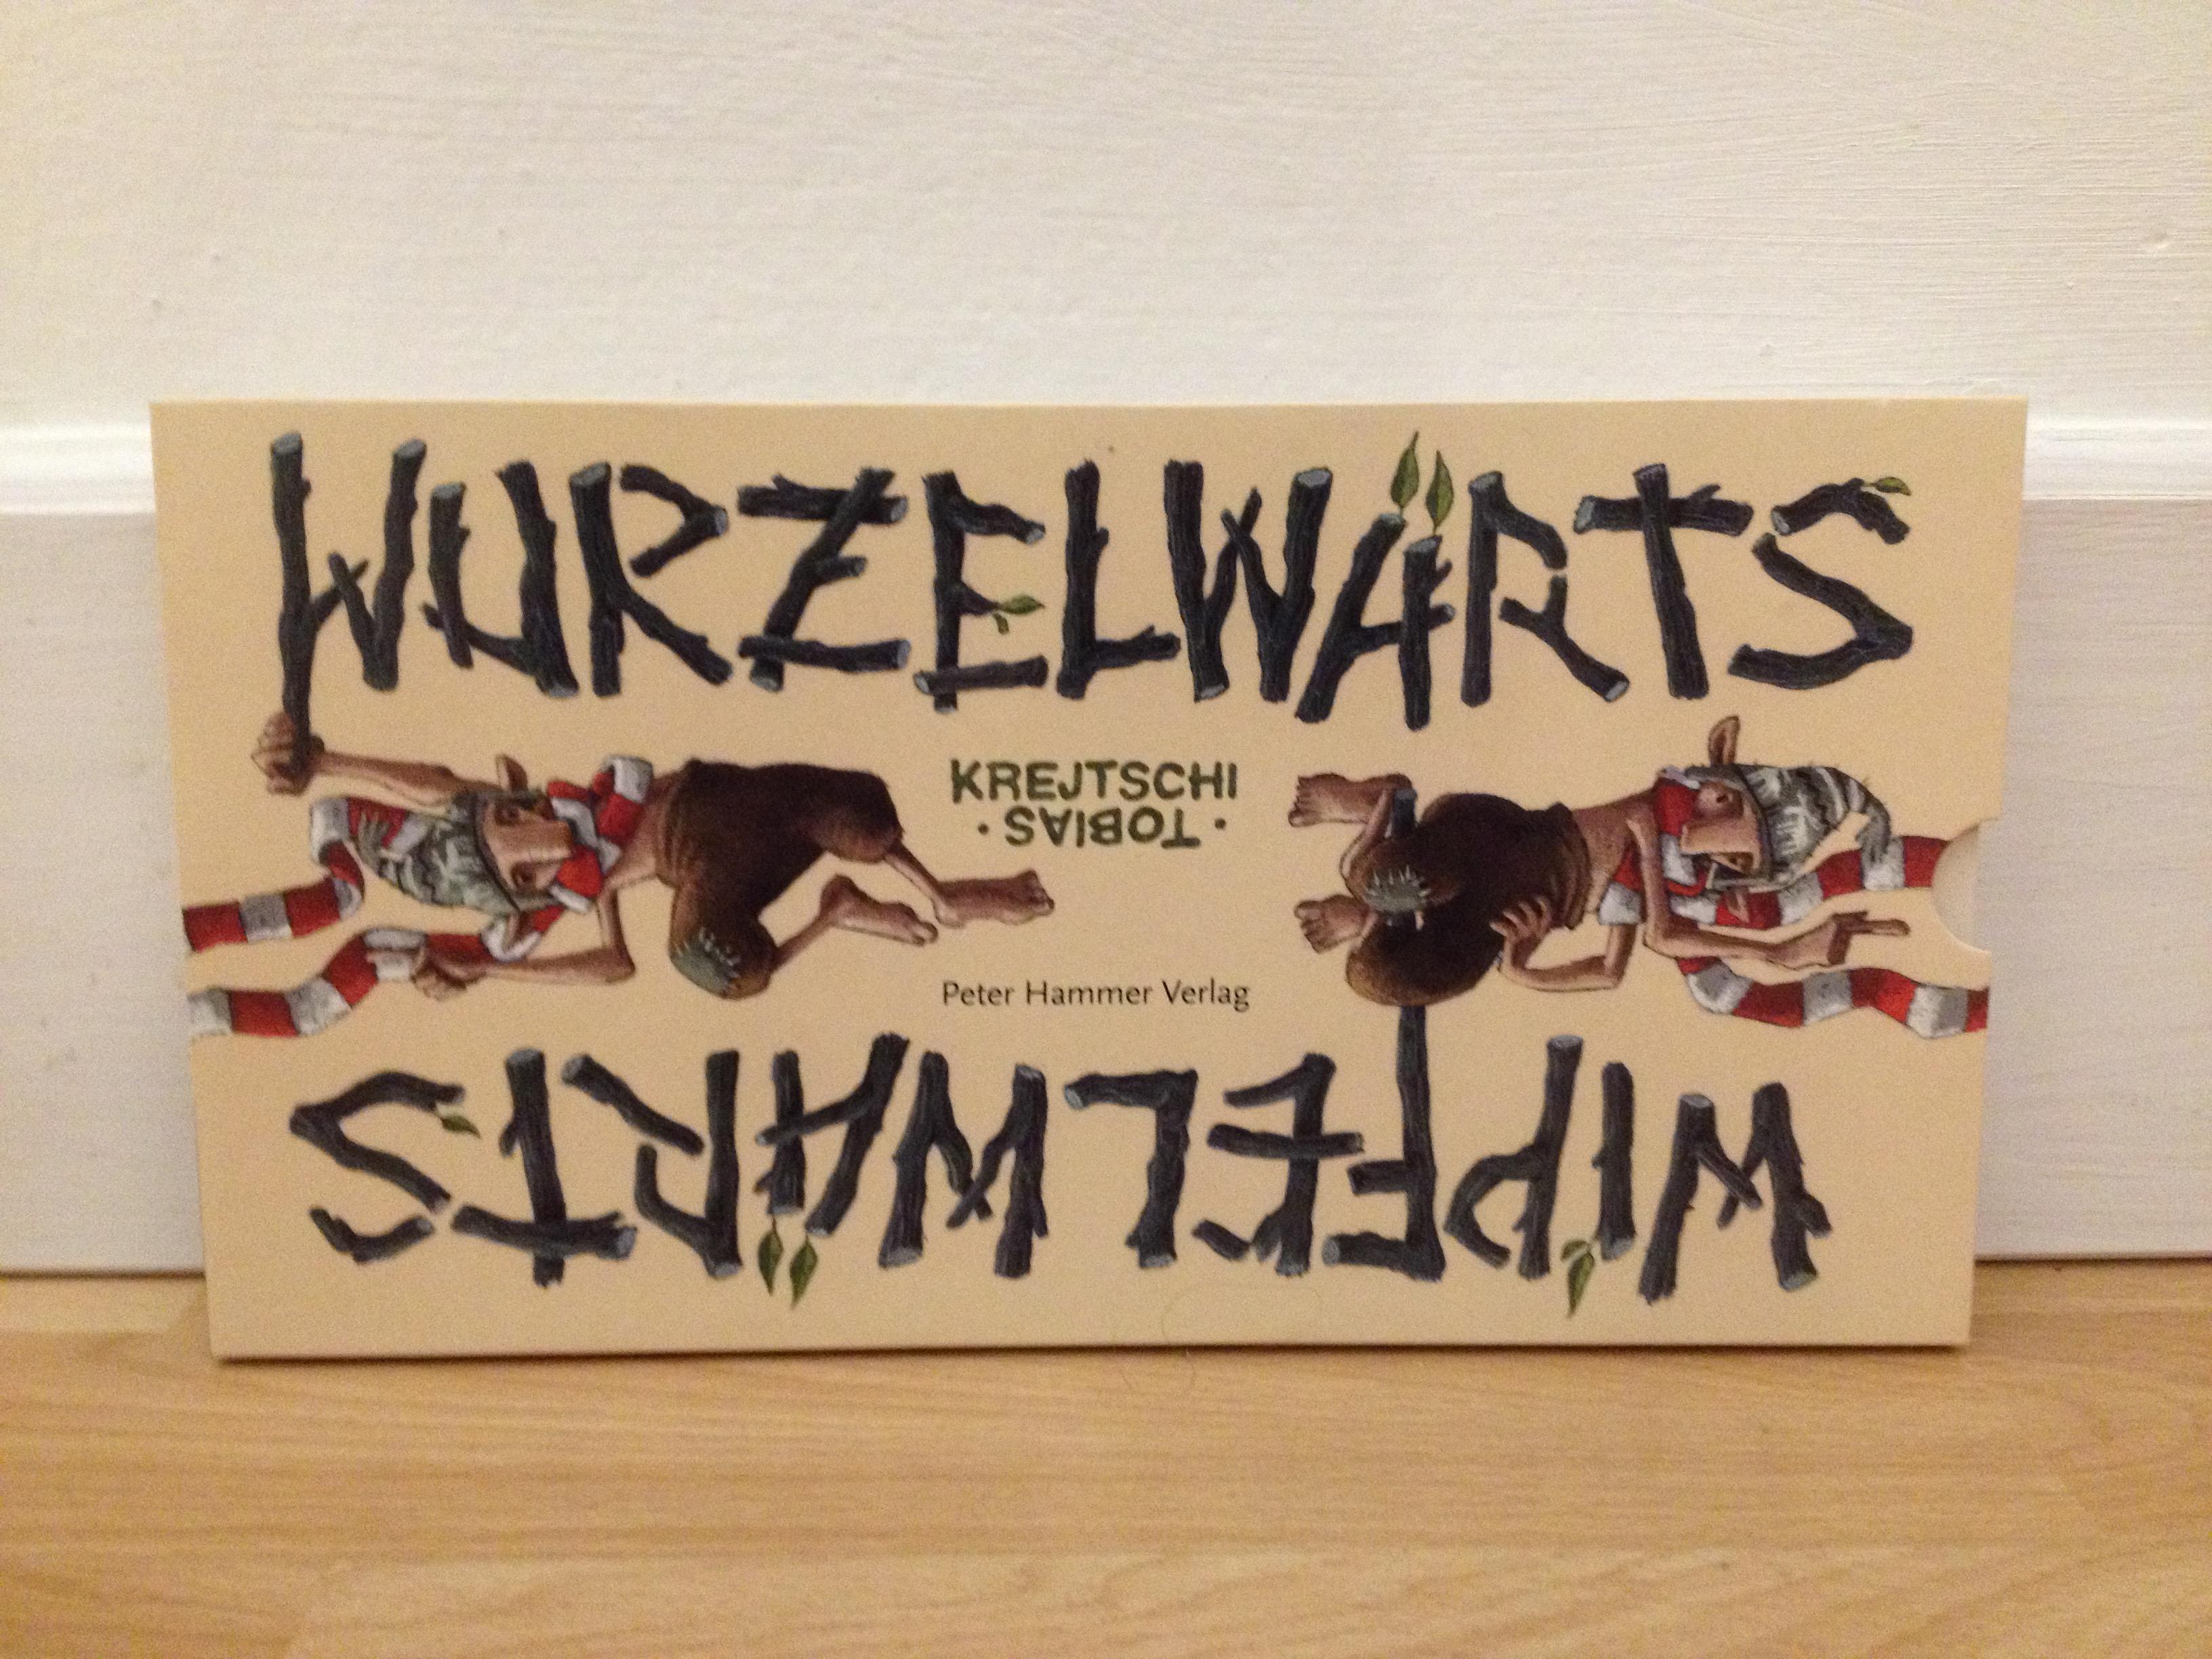 Wurzelwärts - Wipfelwärts Book Cover